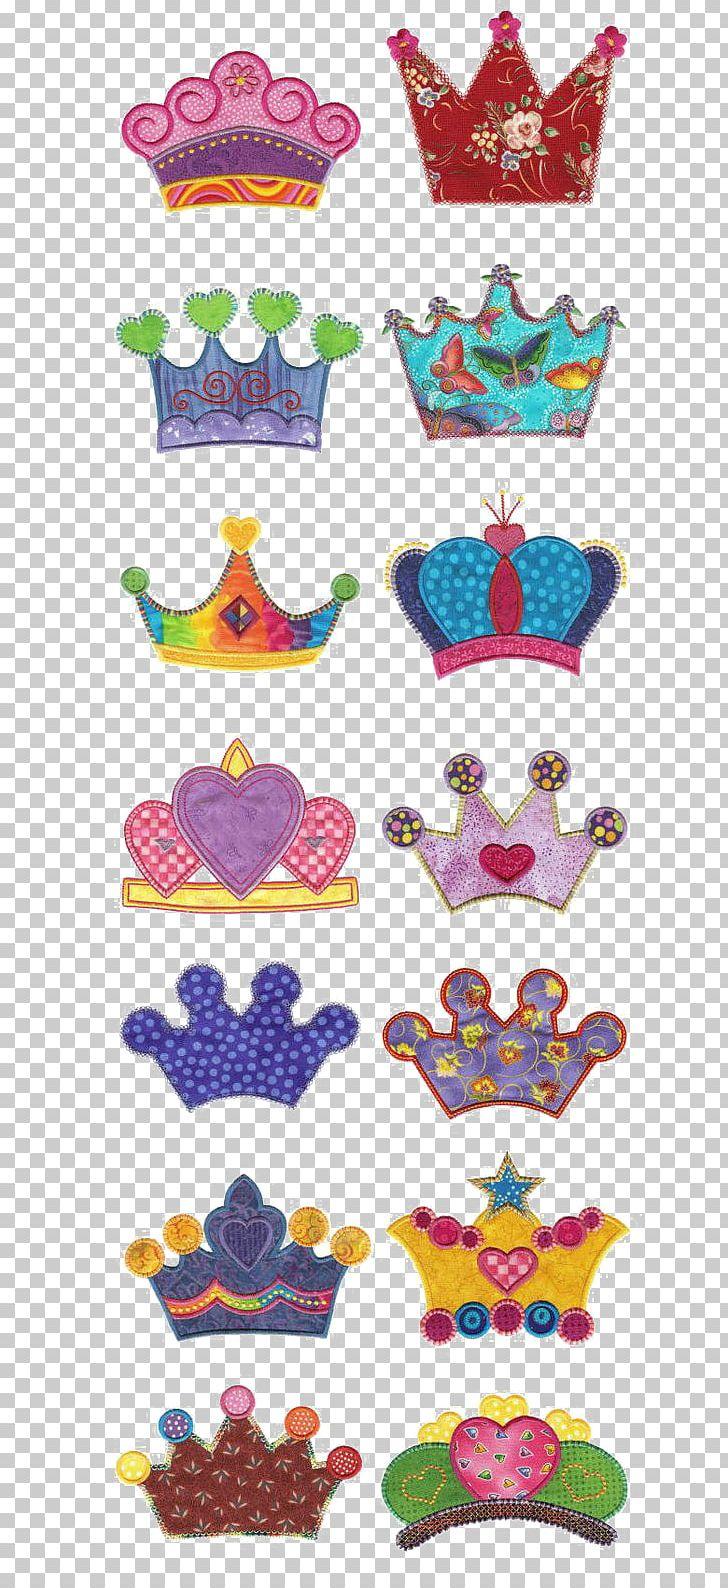 Machine Embroidery Appliquxe9 Pattern PNG, Clipart, Appliquxe9, Art, Askartelu, Bernina International, Cartoon Free PNG Download